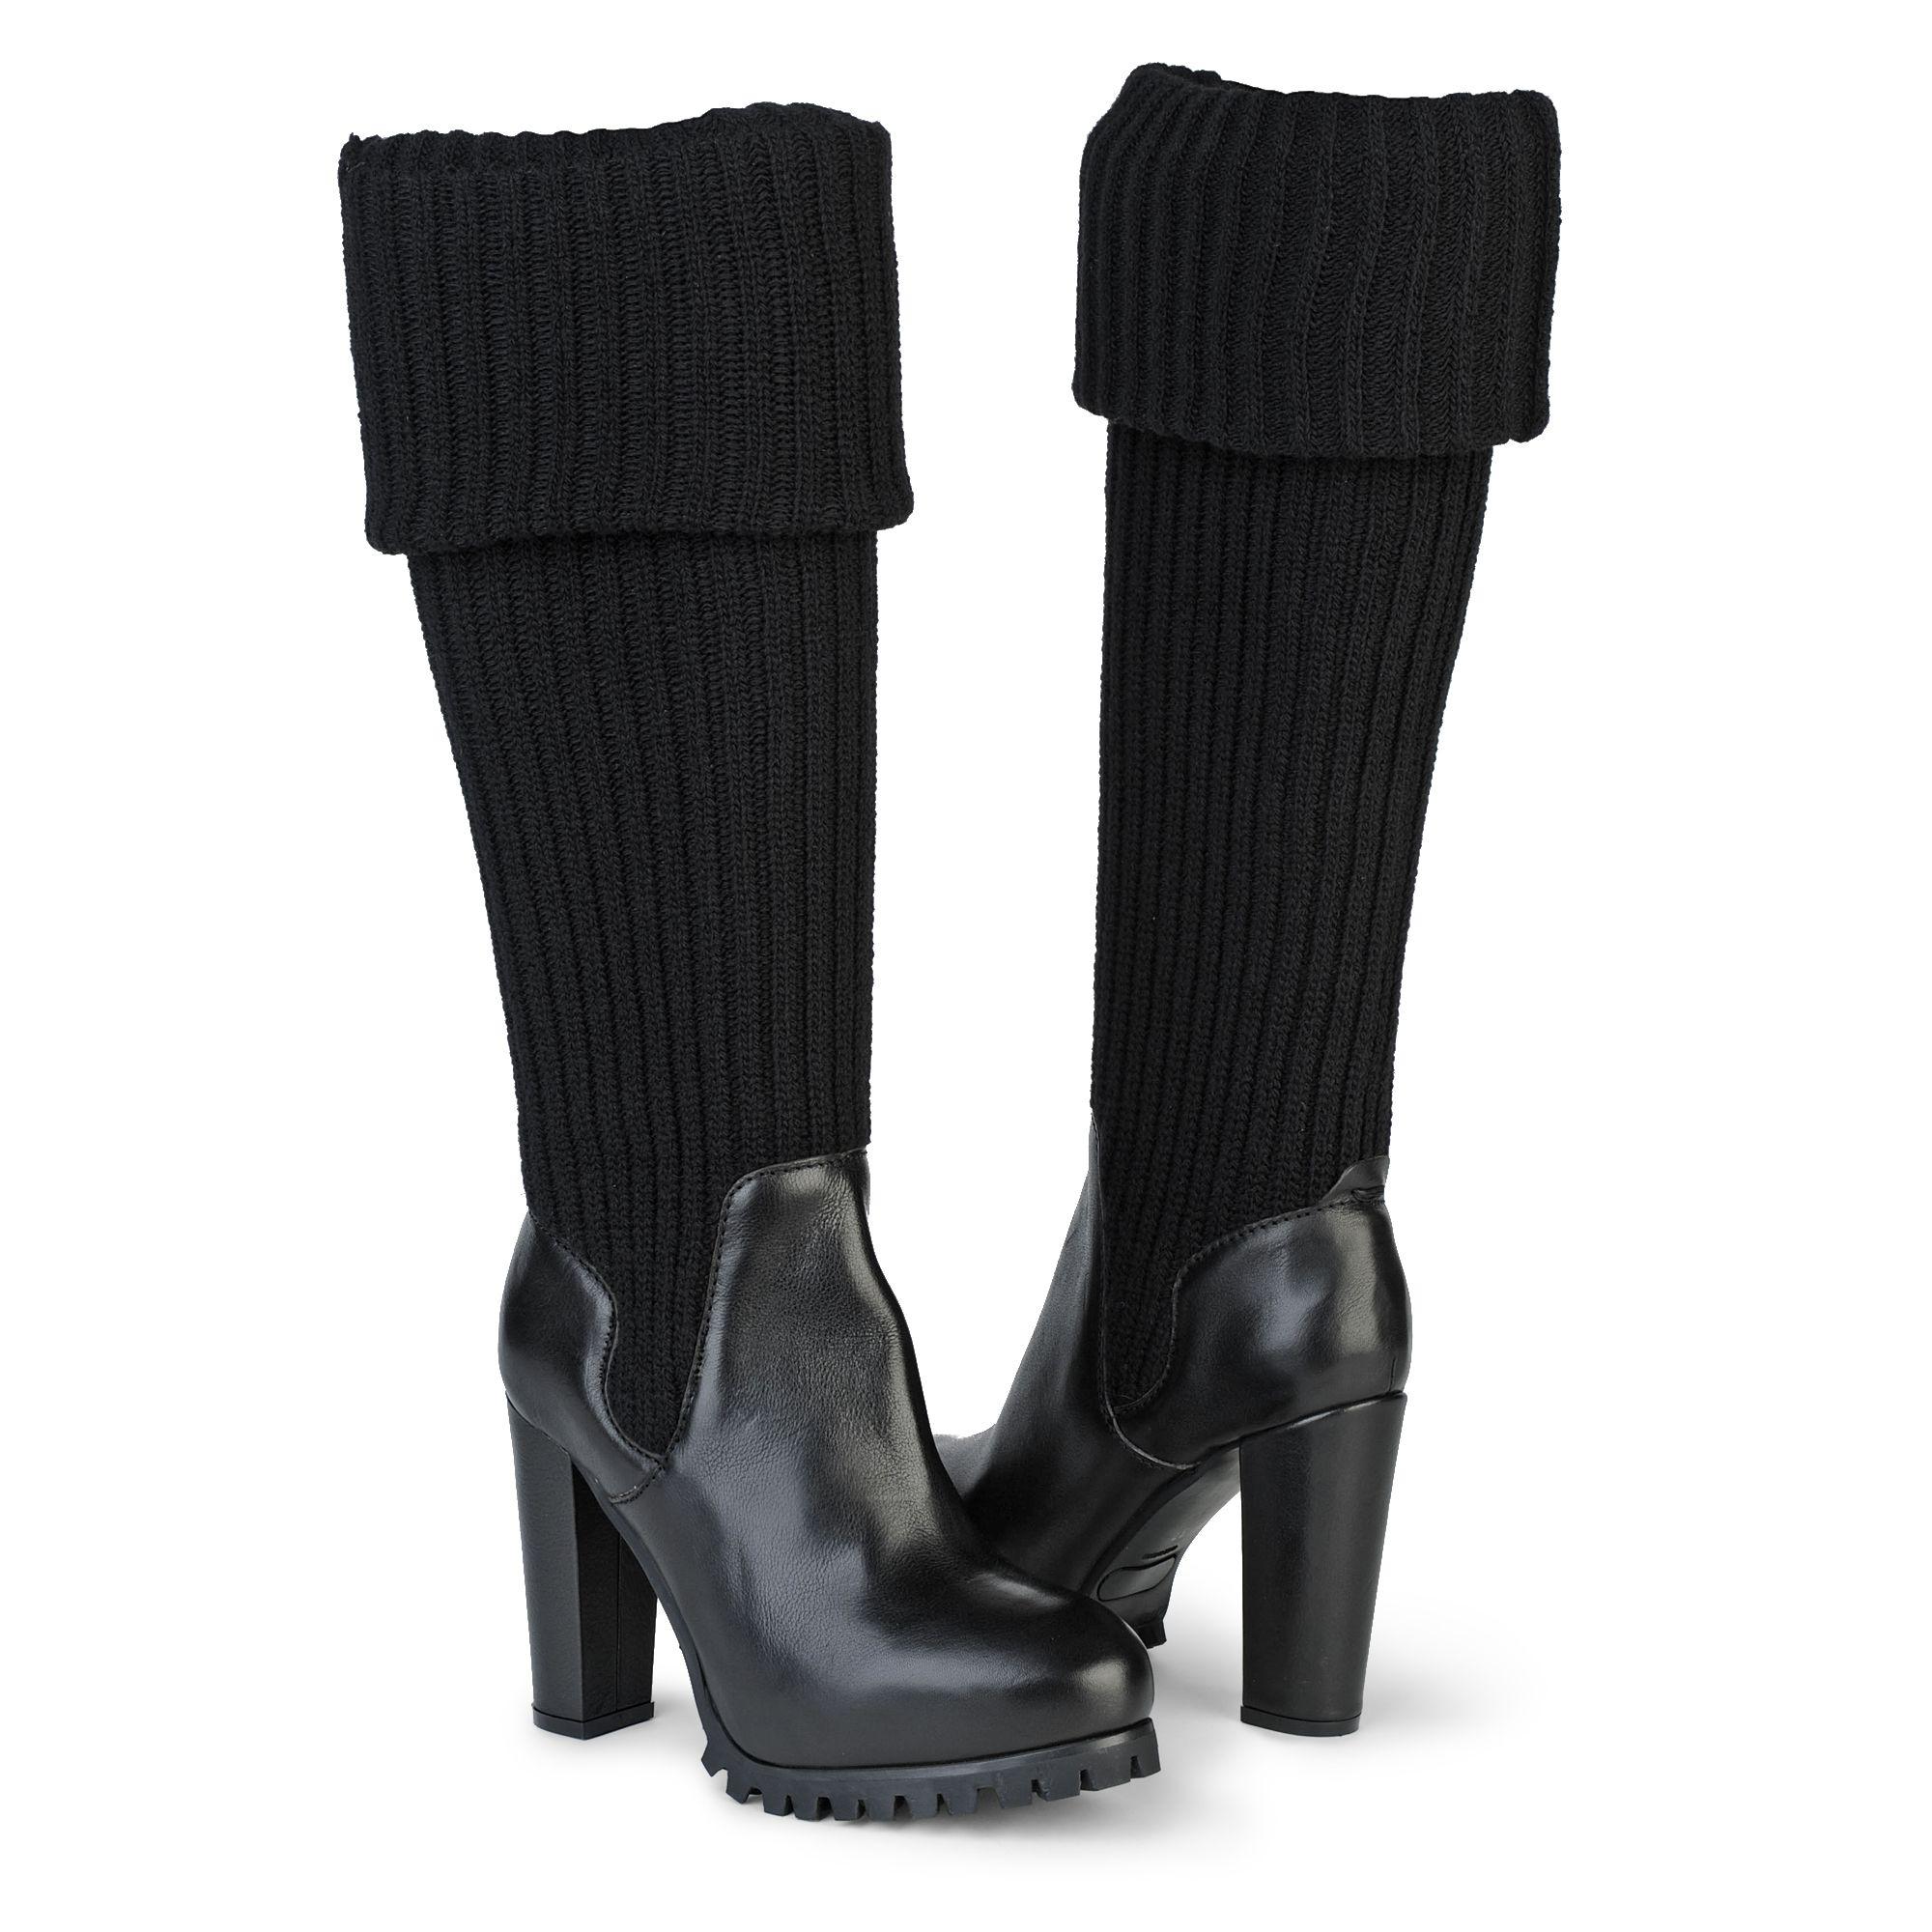 kurt geiger williamsburgh knee high boot in black lyst